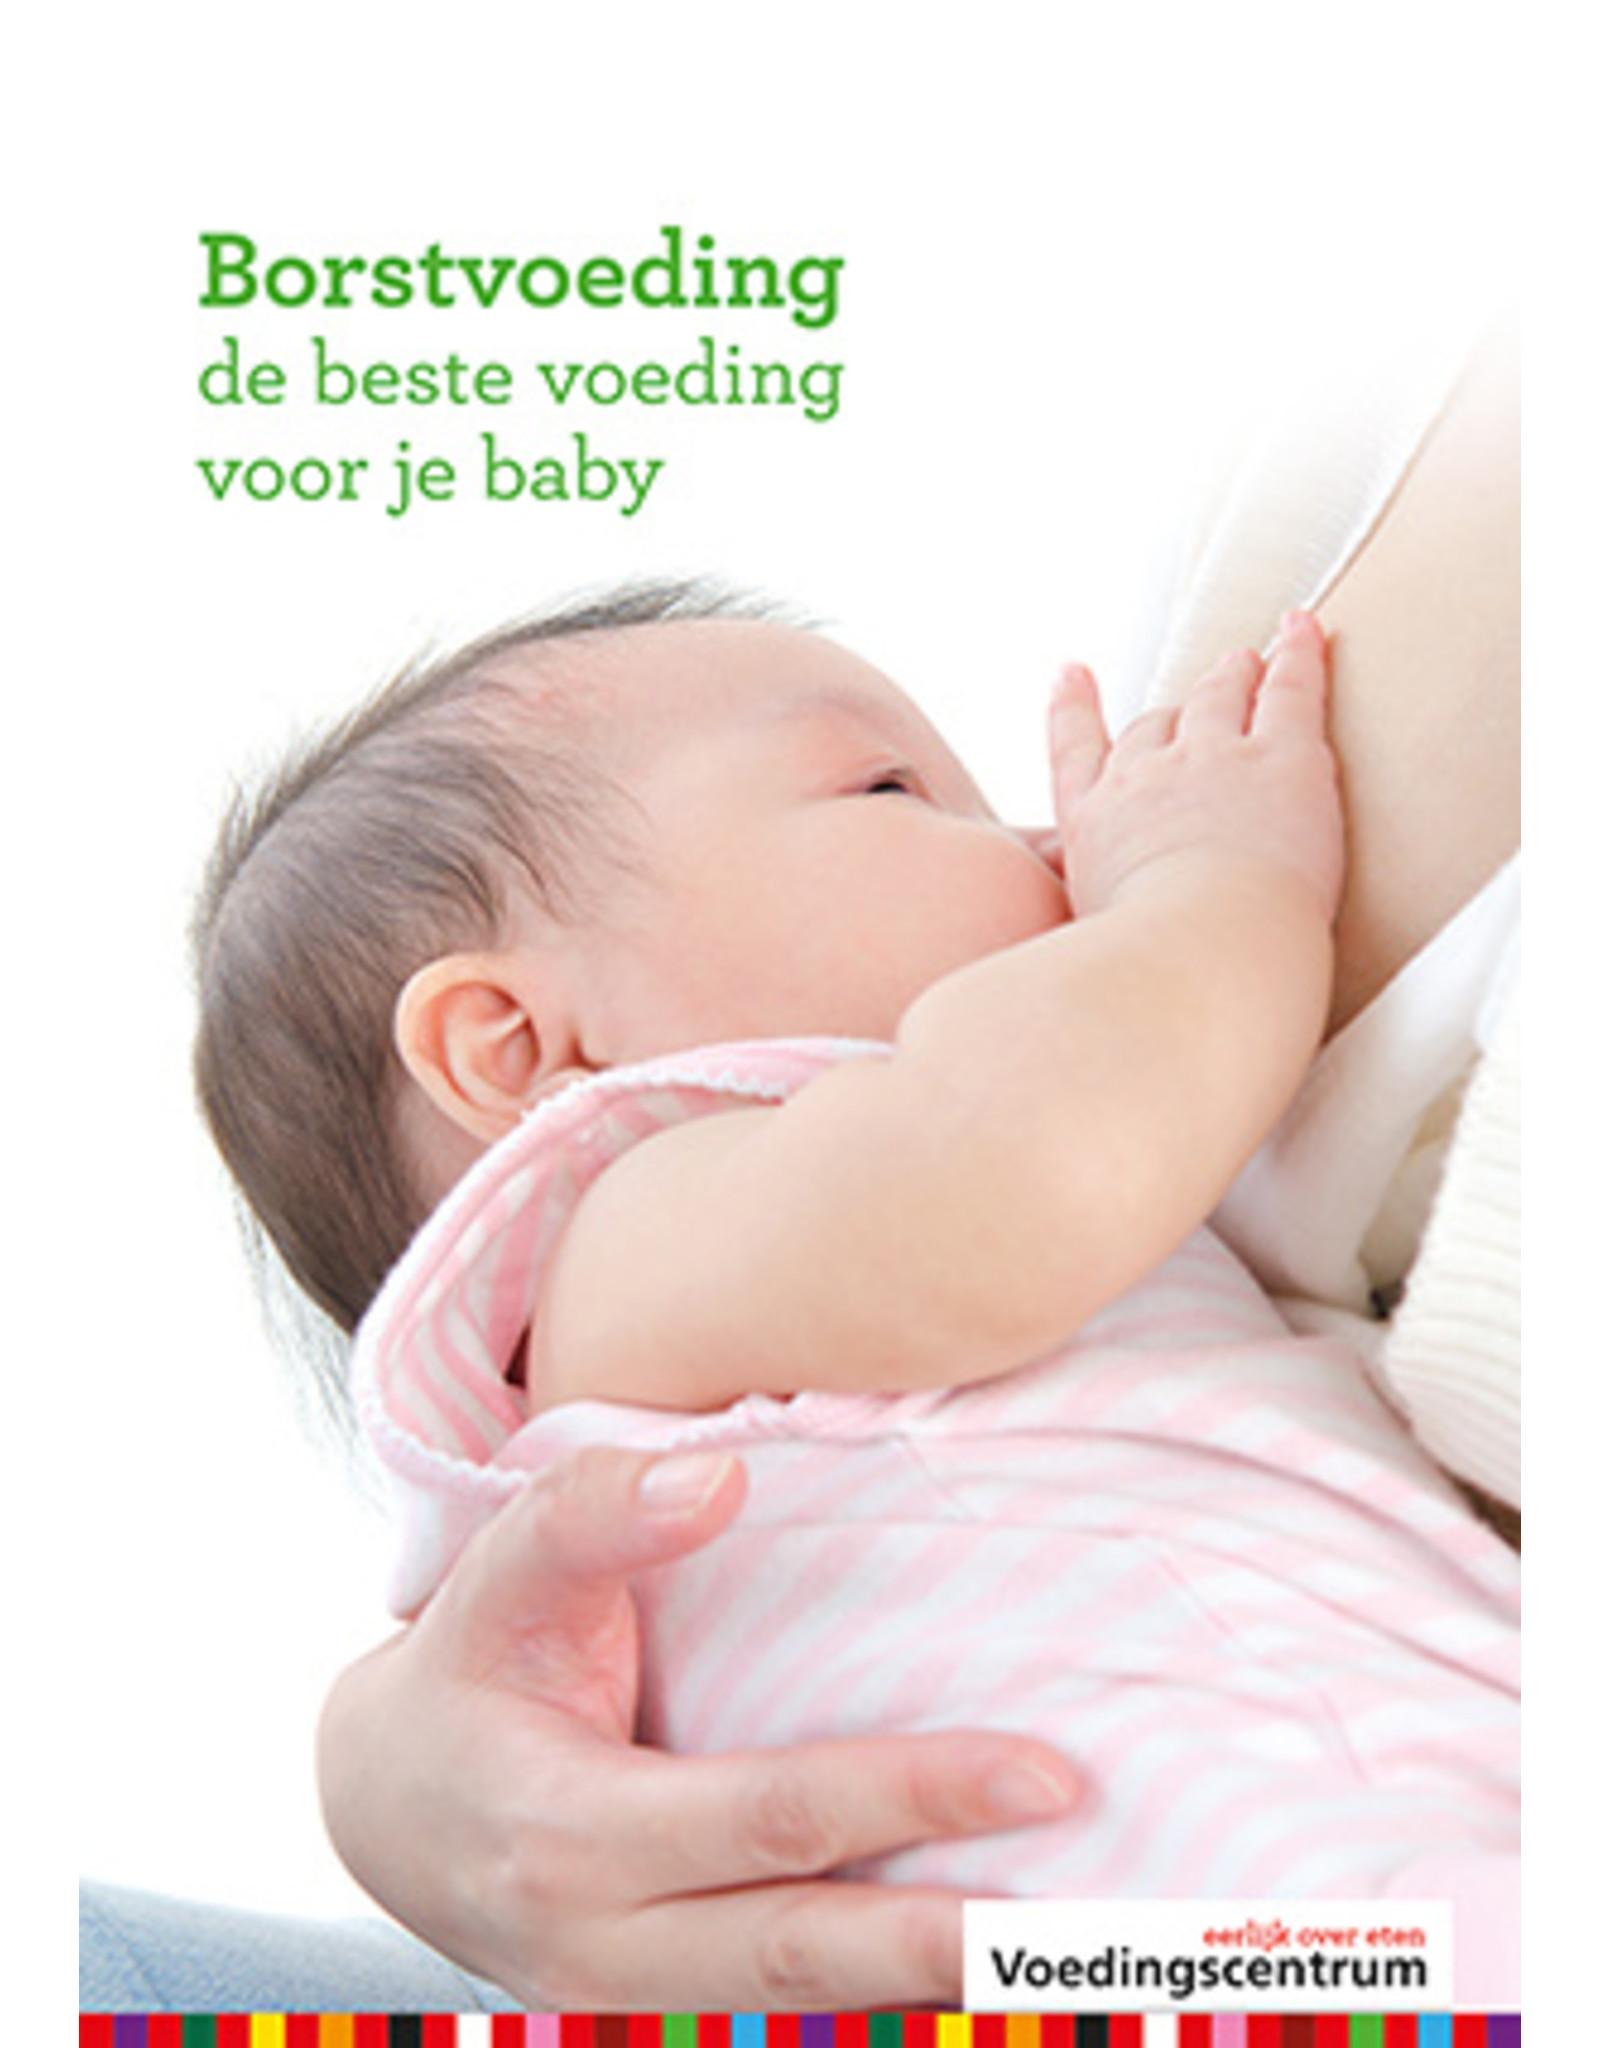 Borstvoeding - Body & Soap